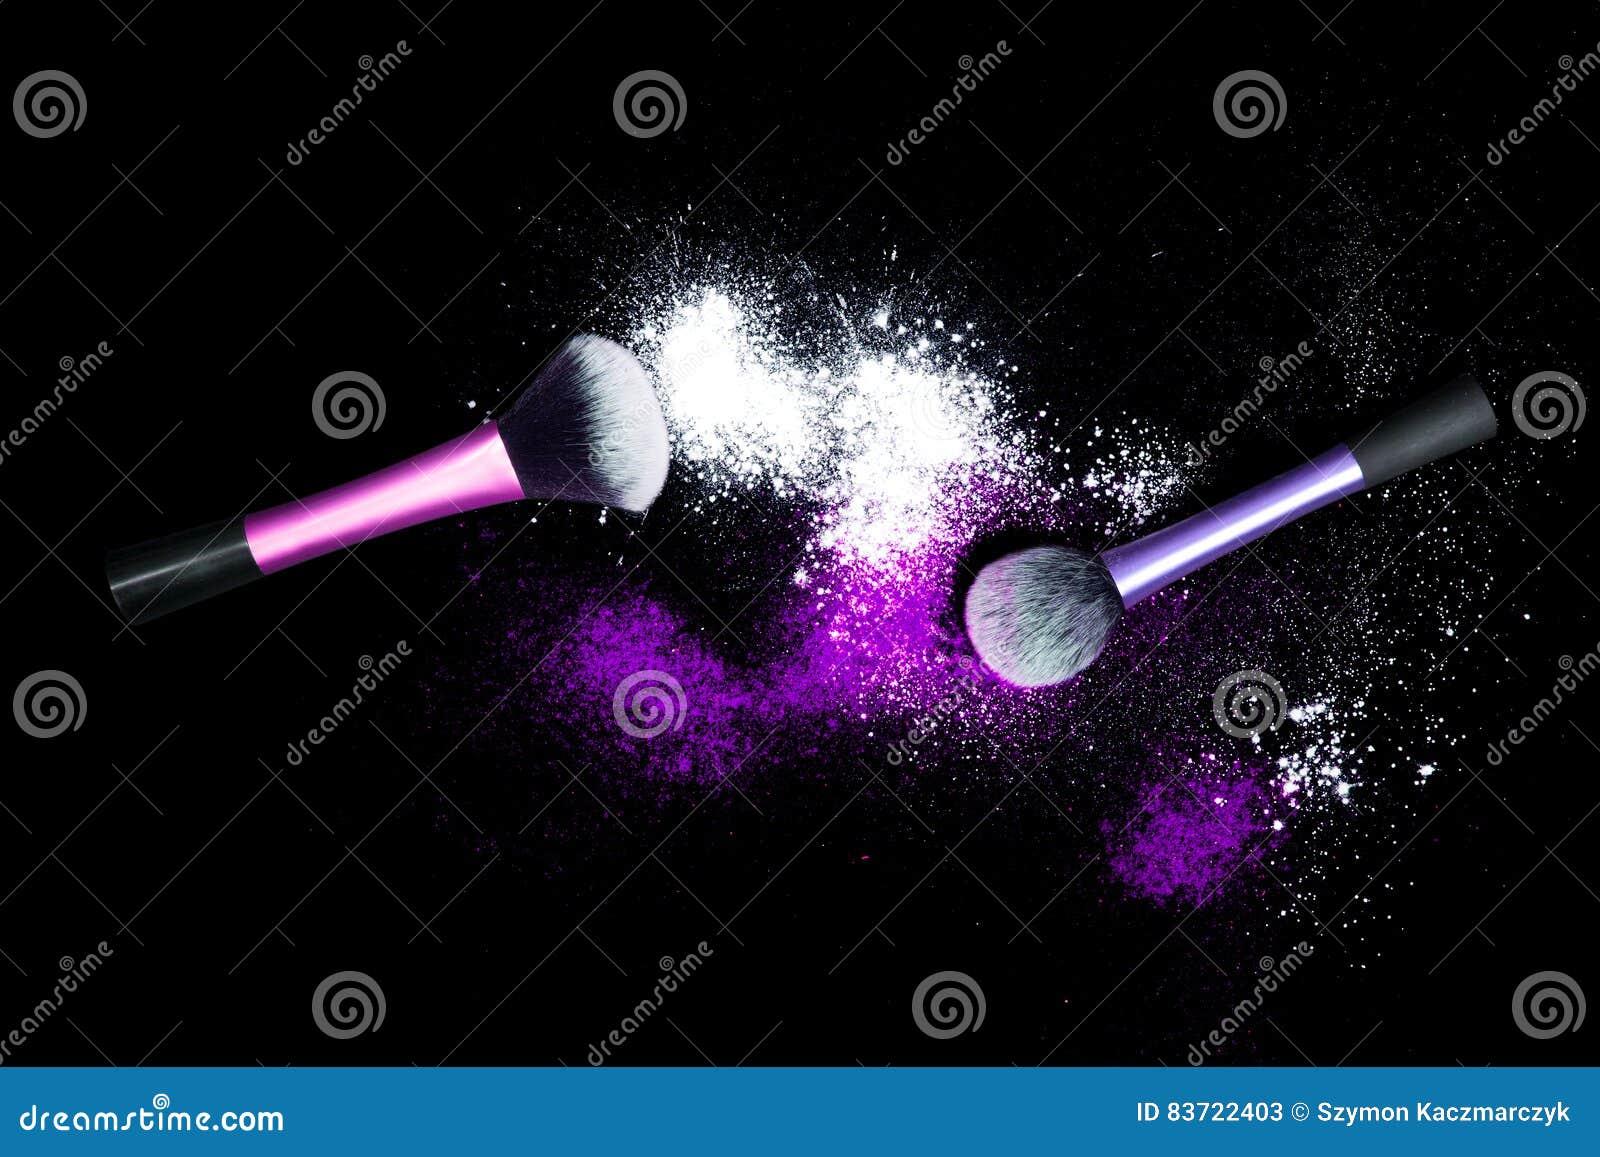 Make-up brush with white powder spilled glitter dust on black background. Makeup brush